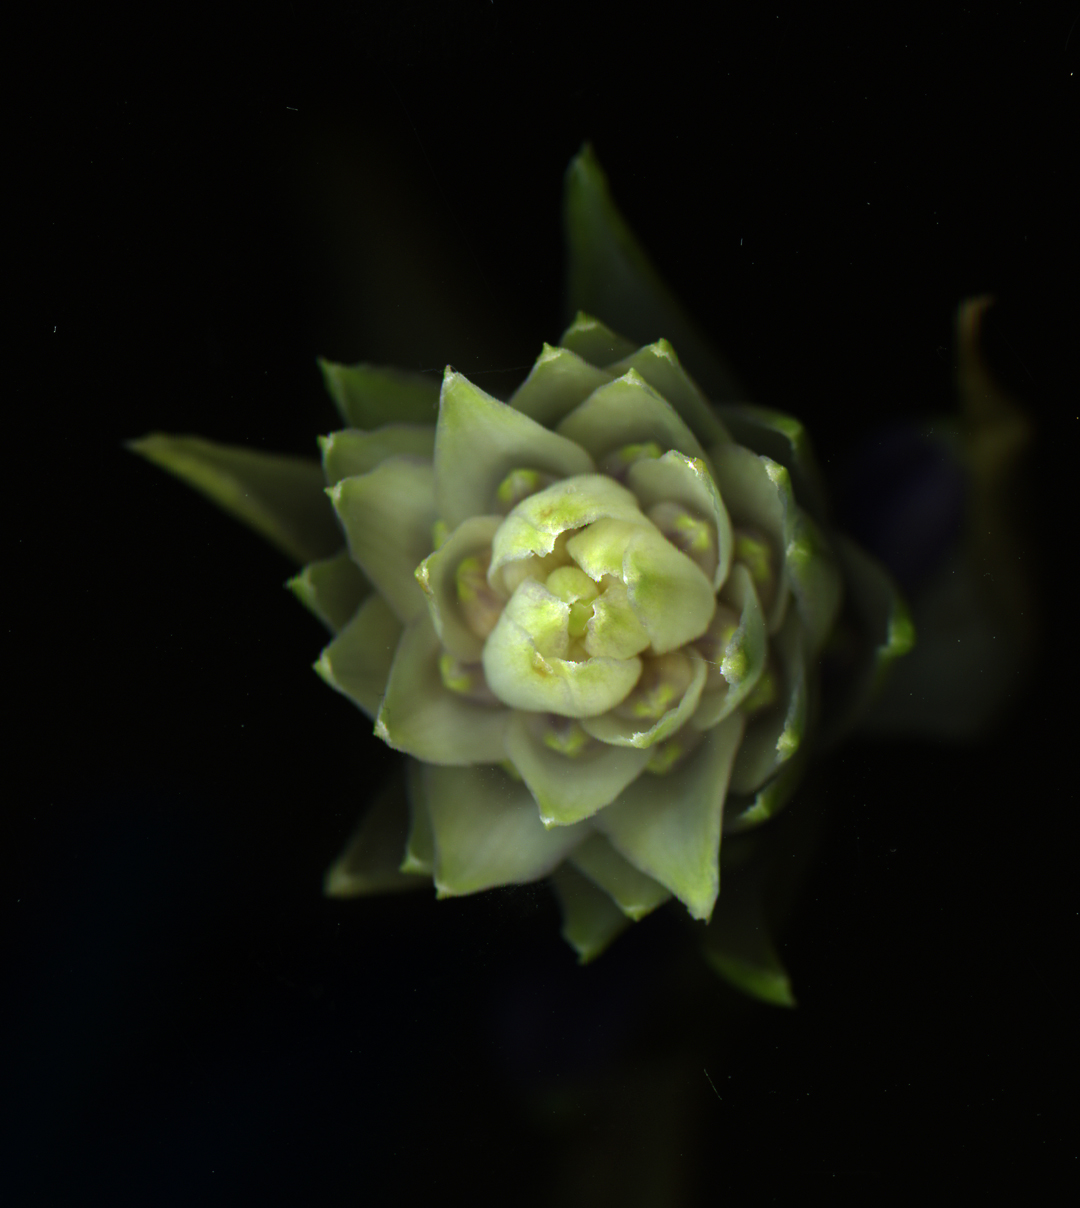 Alex Waterhouse-Hayward: Some Of My Plants Don't Bark on